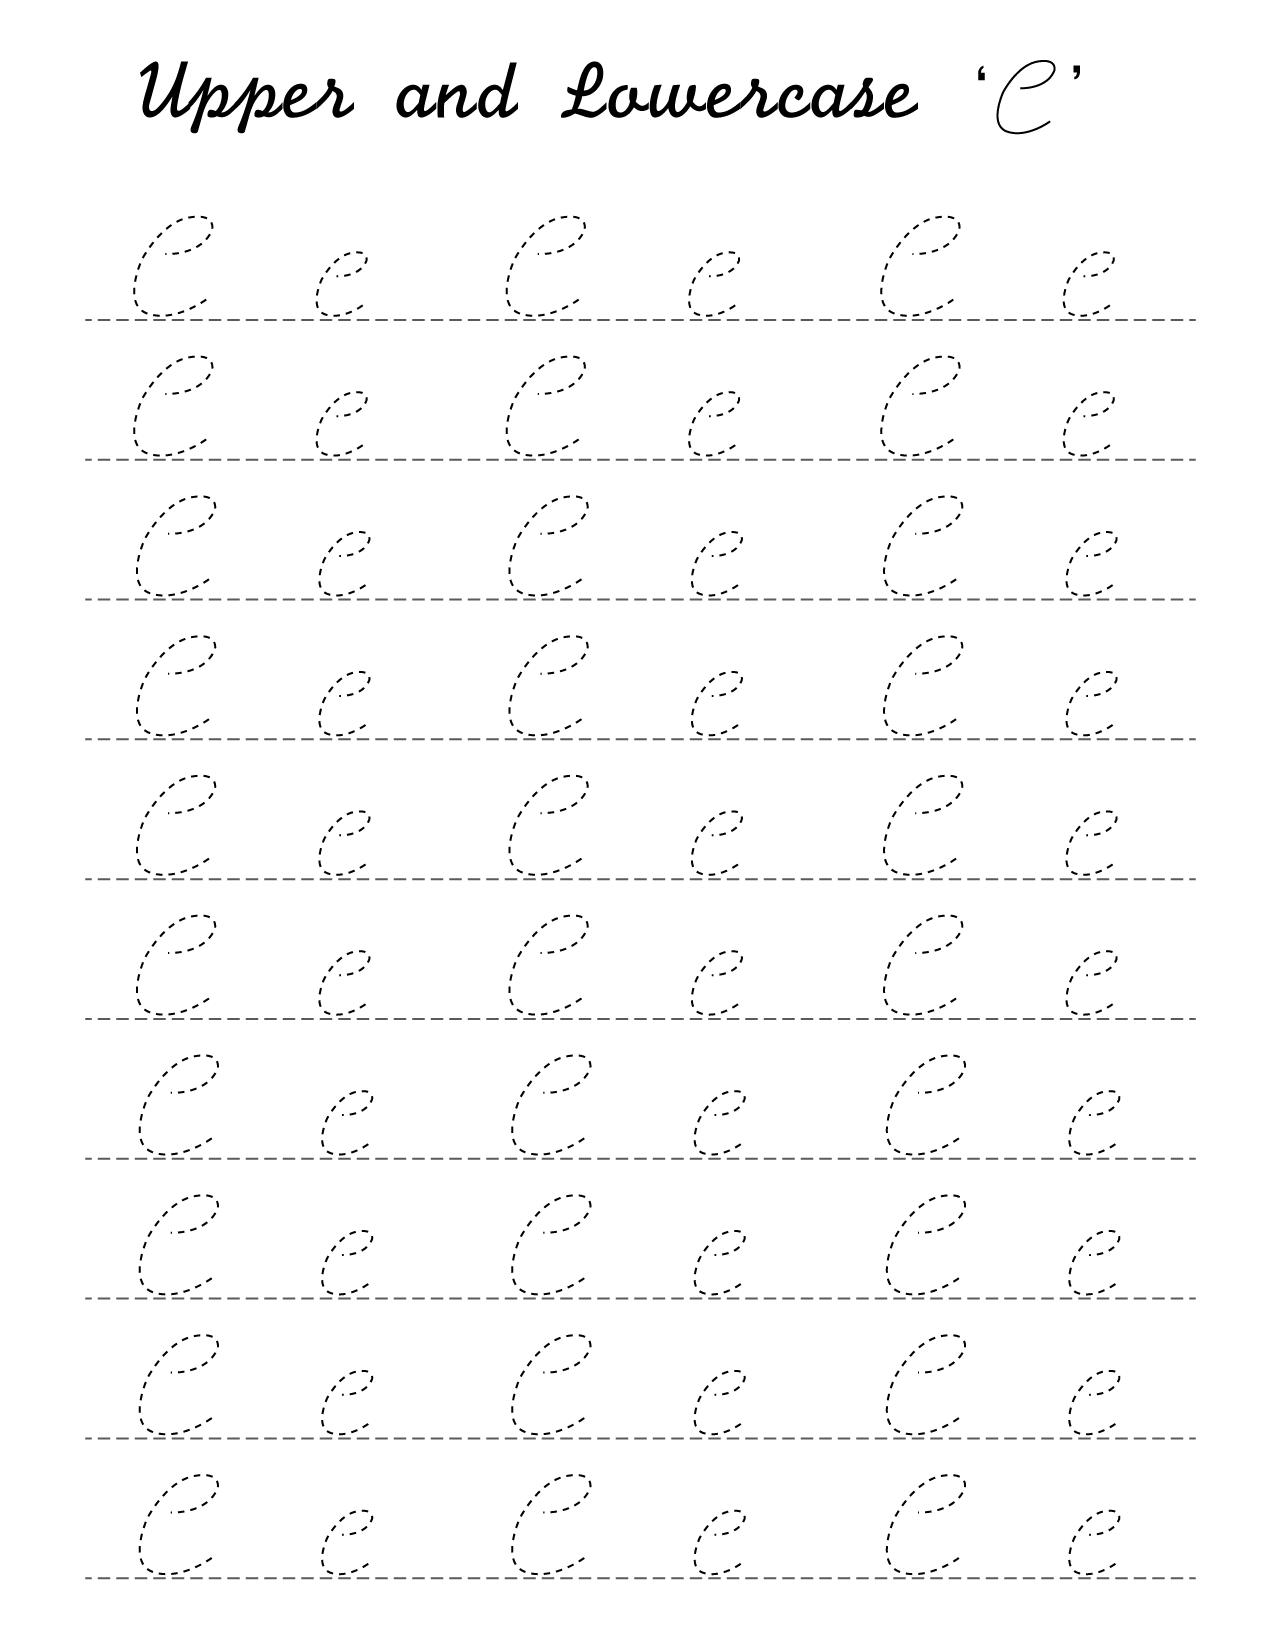 Cursive 'C' worksheet